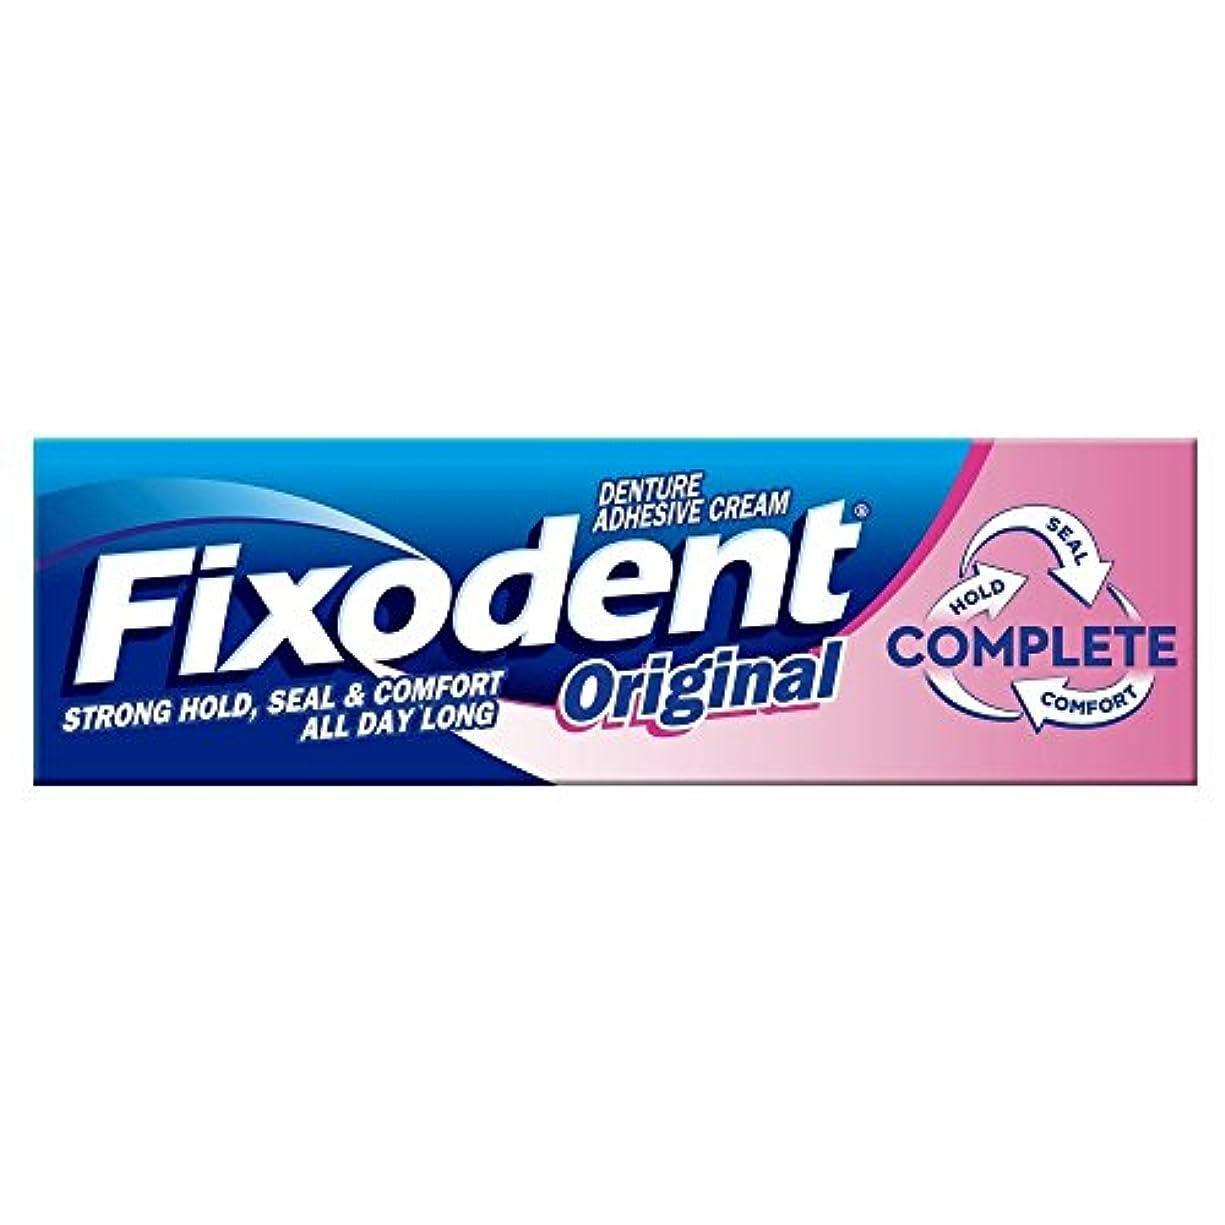 Fixodent Original Denture Adhesive Cream (40ml) Fixodentオリジナルの義歯接着剤クリーム( 40ミリリットル) [並行輸入品]